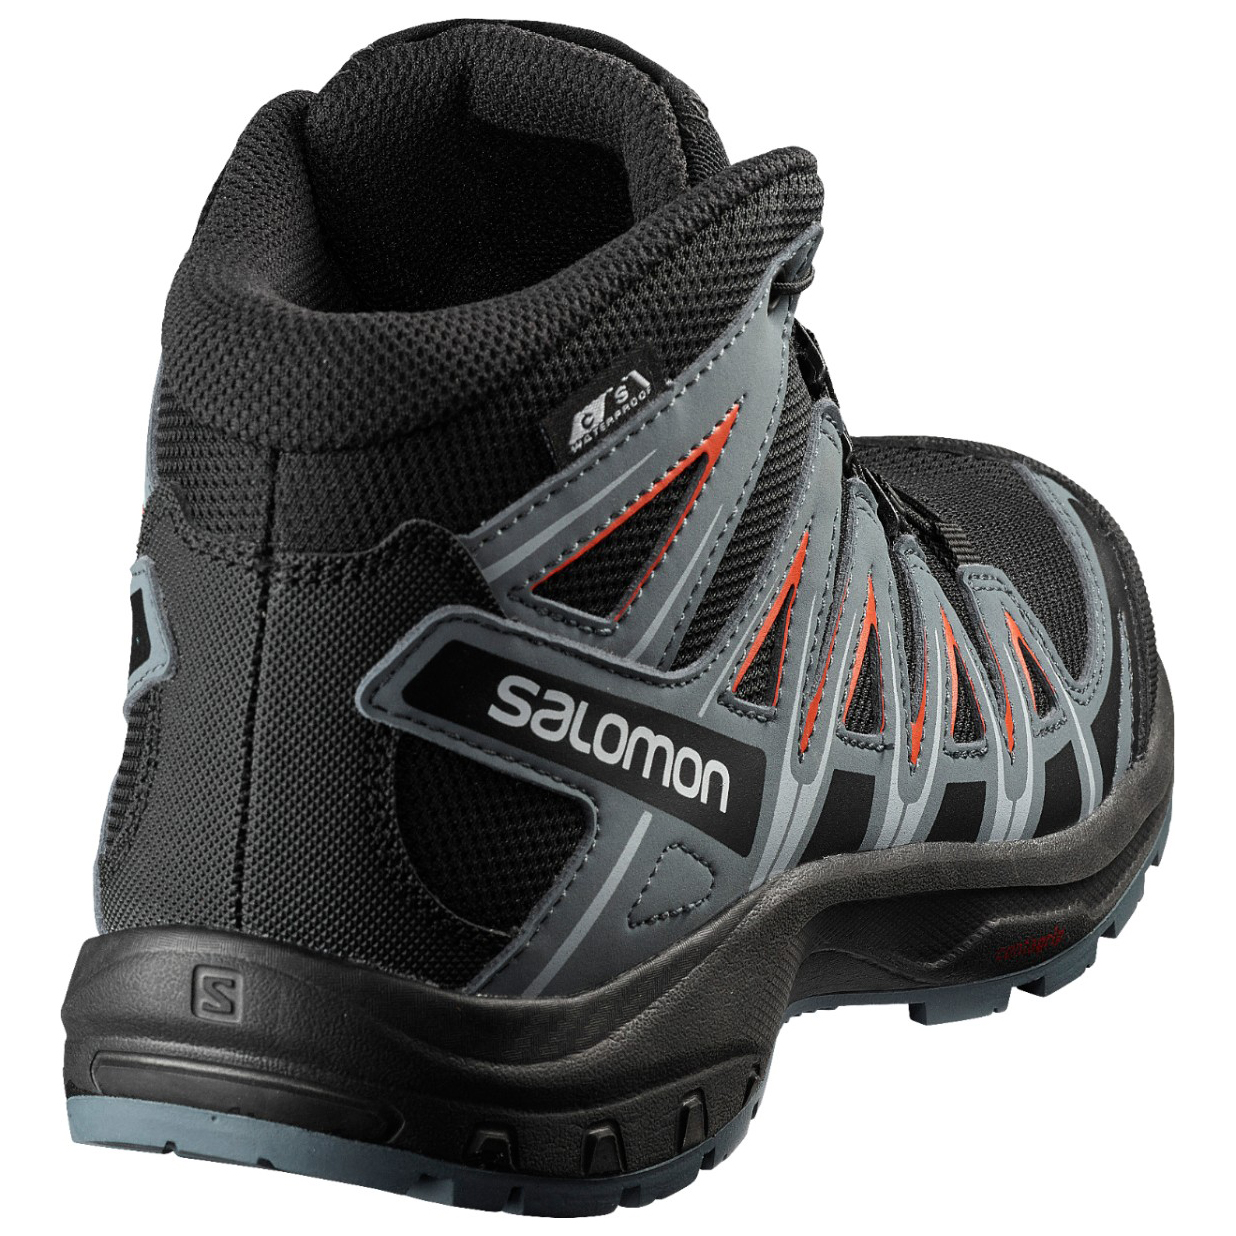 Salomon Kid's Xa Pro 3D Mid CSWP Chaussures de randonnée Black Stormy Weather Cherry Tomato | 31 (EU)